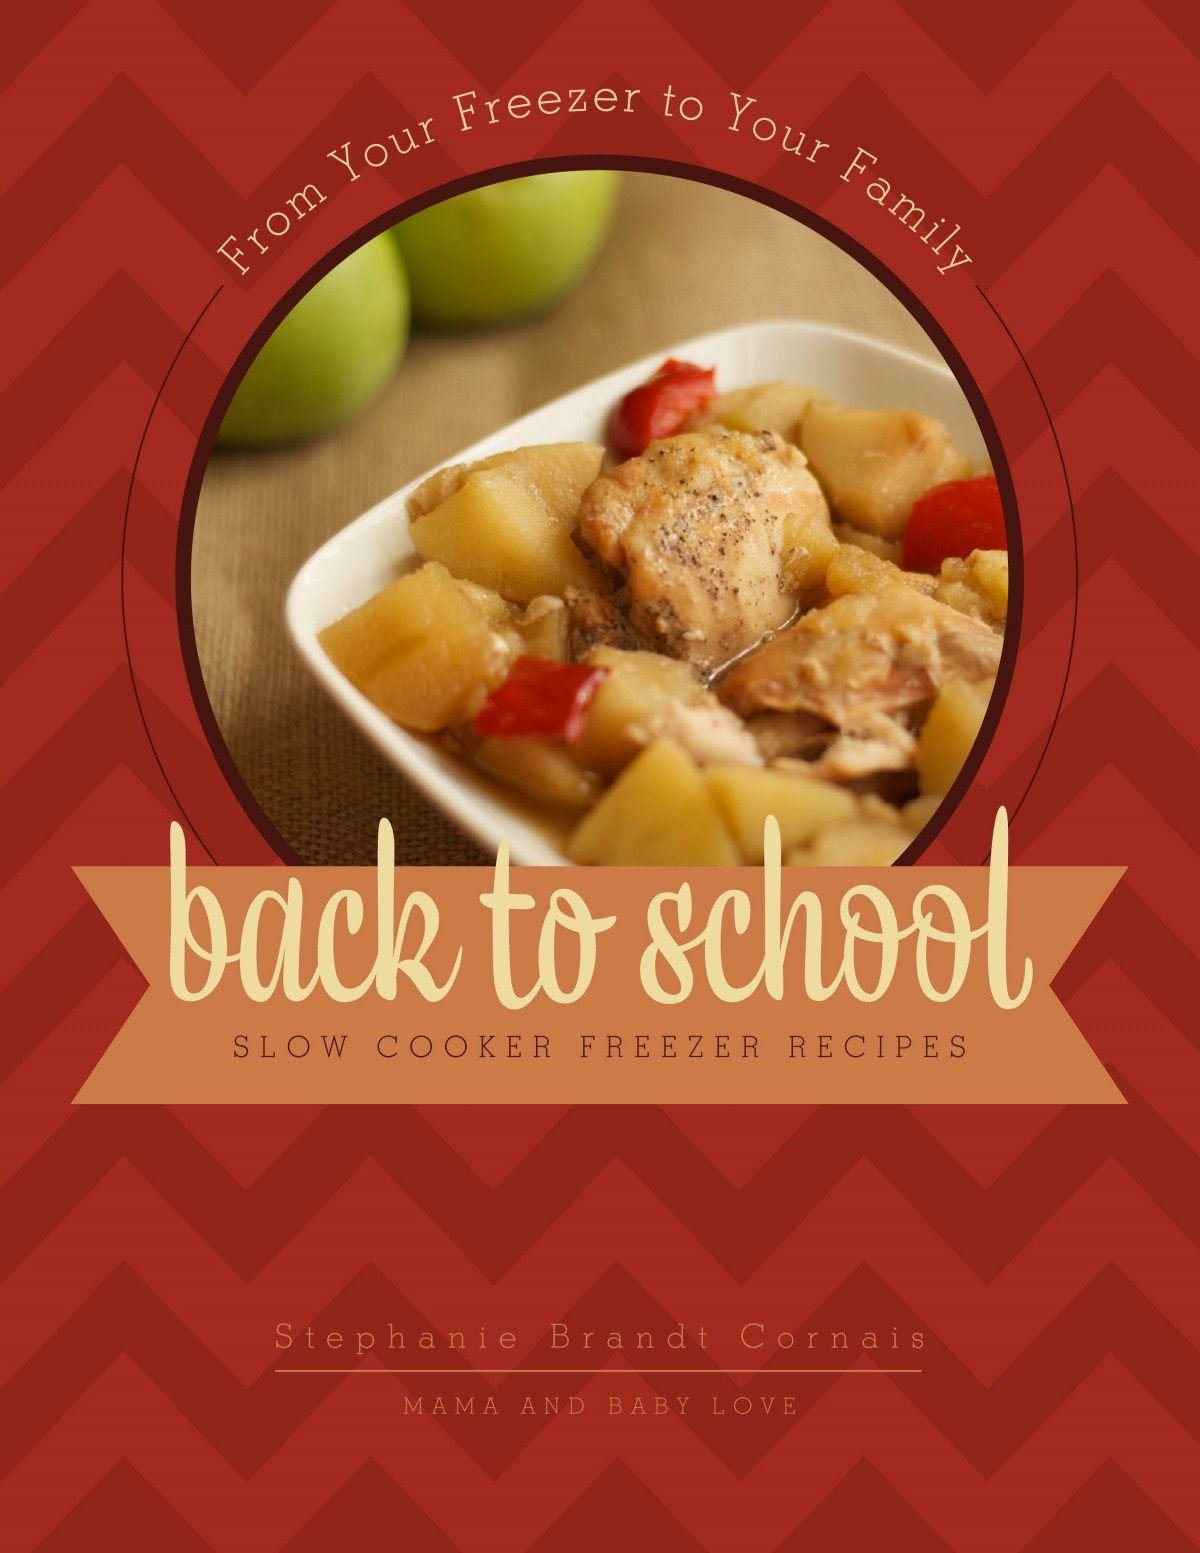 back-to-school-cookbook